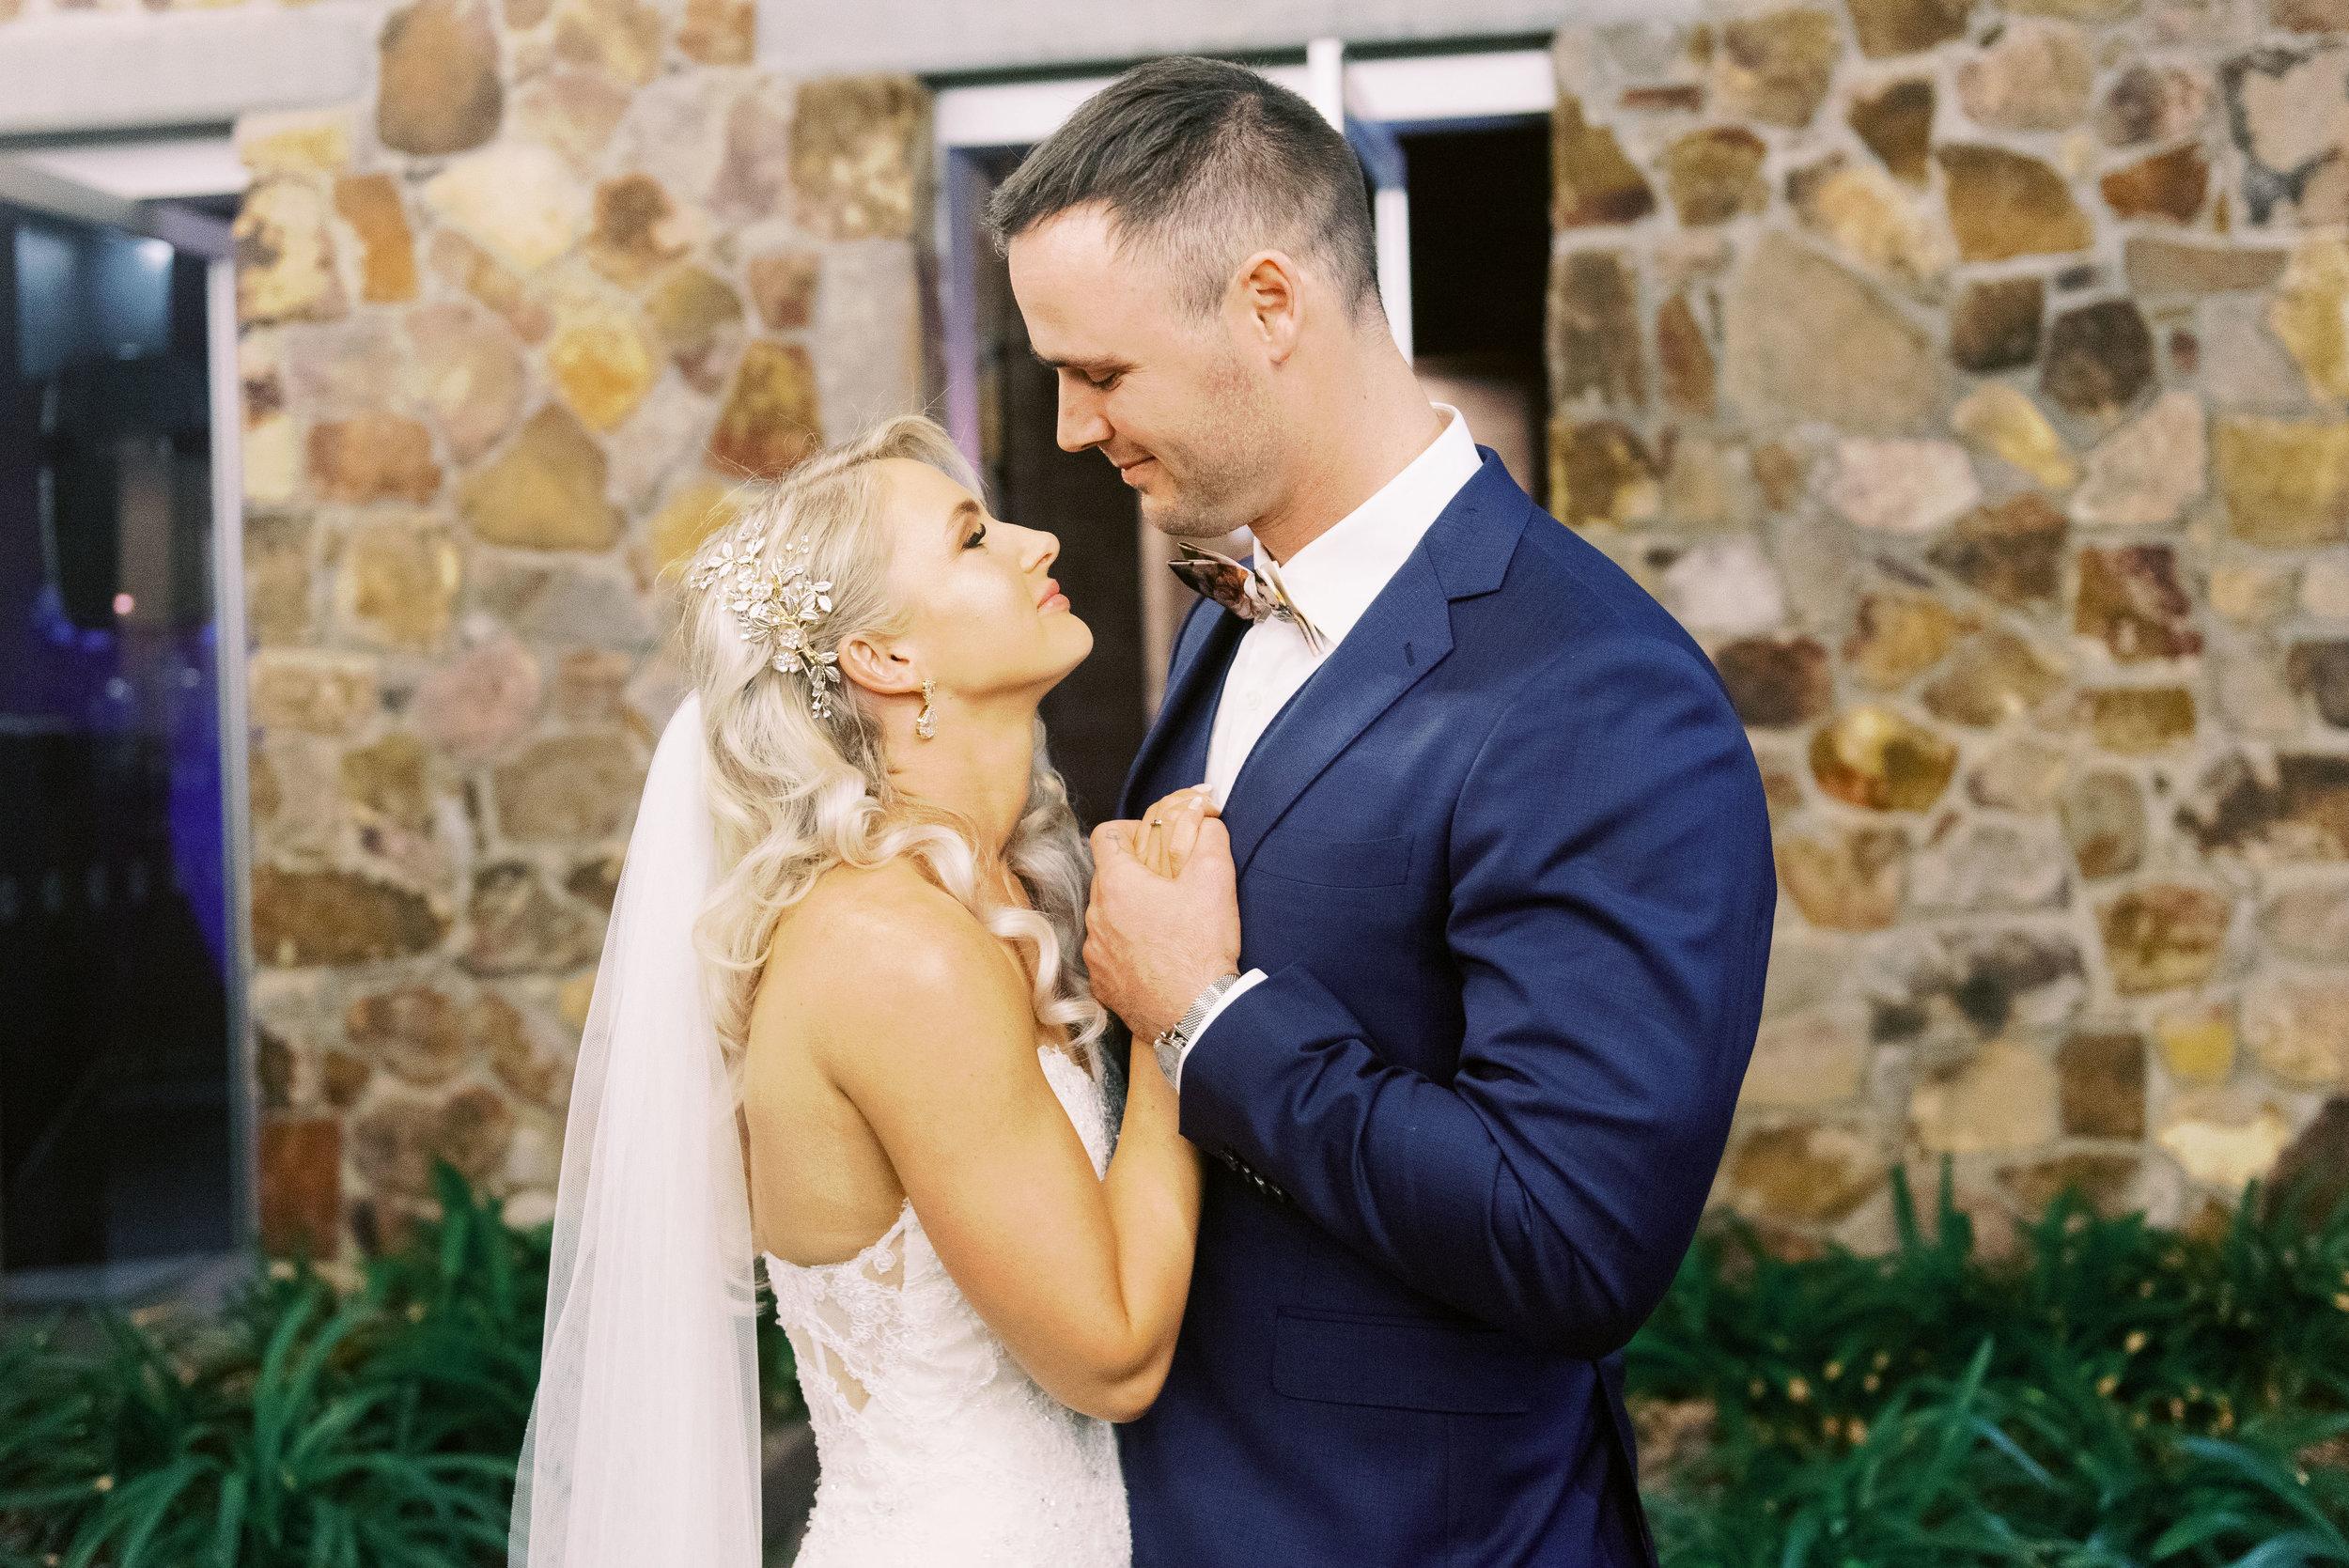 Kooroomba-Vineyard-Lavender-Farm-Wedding-Fine-Art-Lauren-Olivia-92.jpg